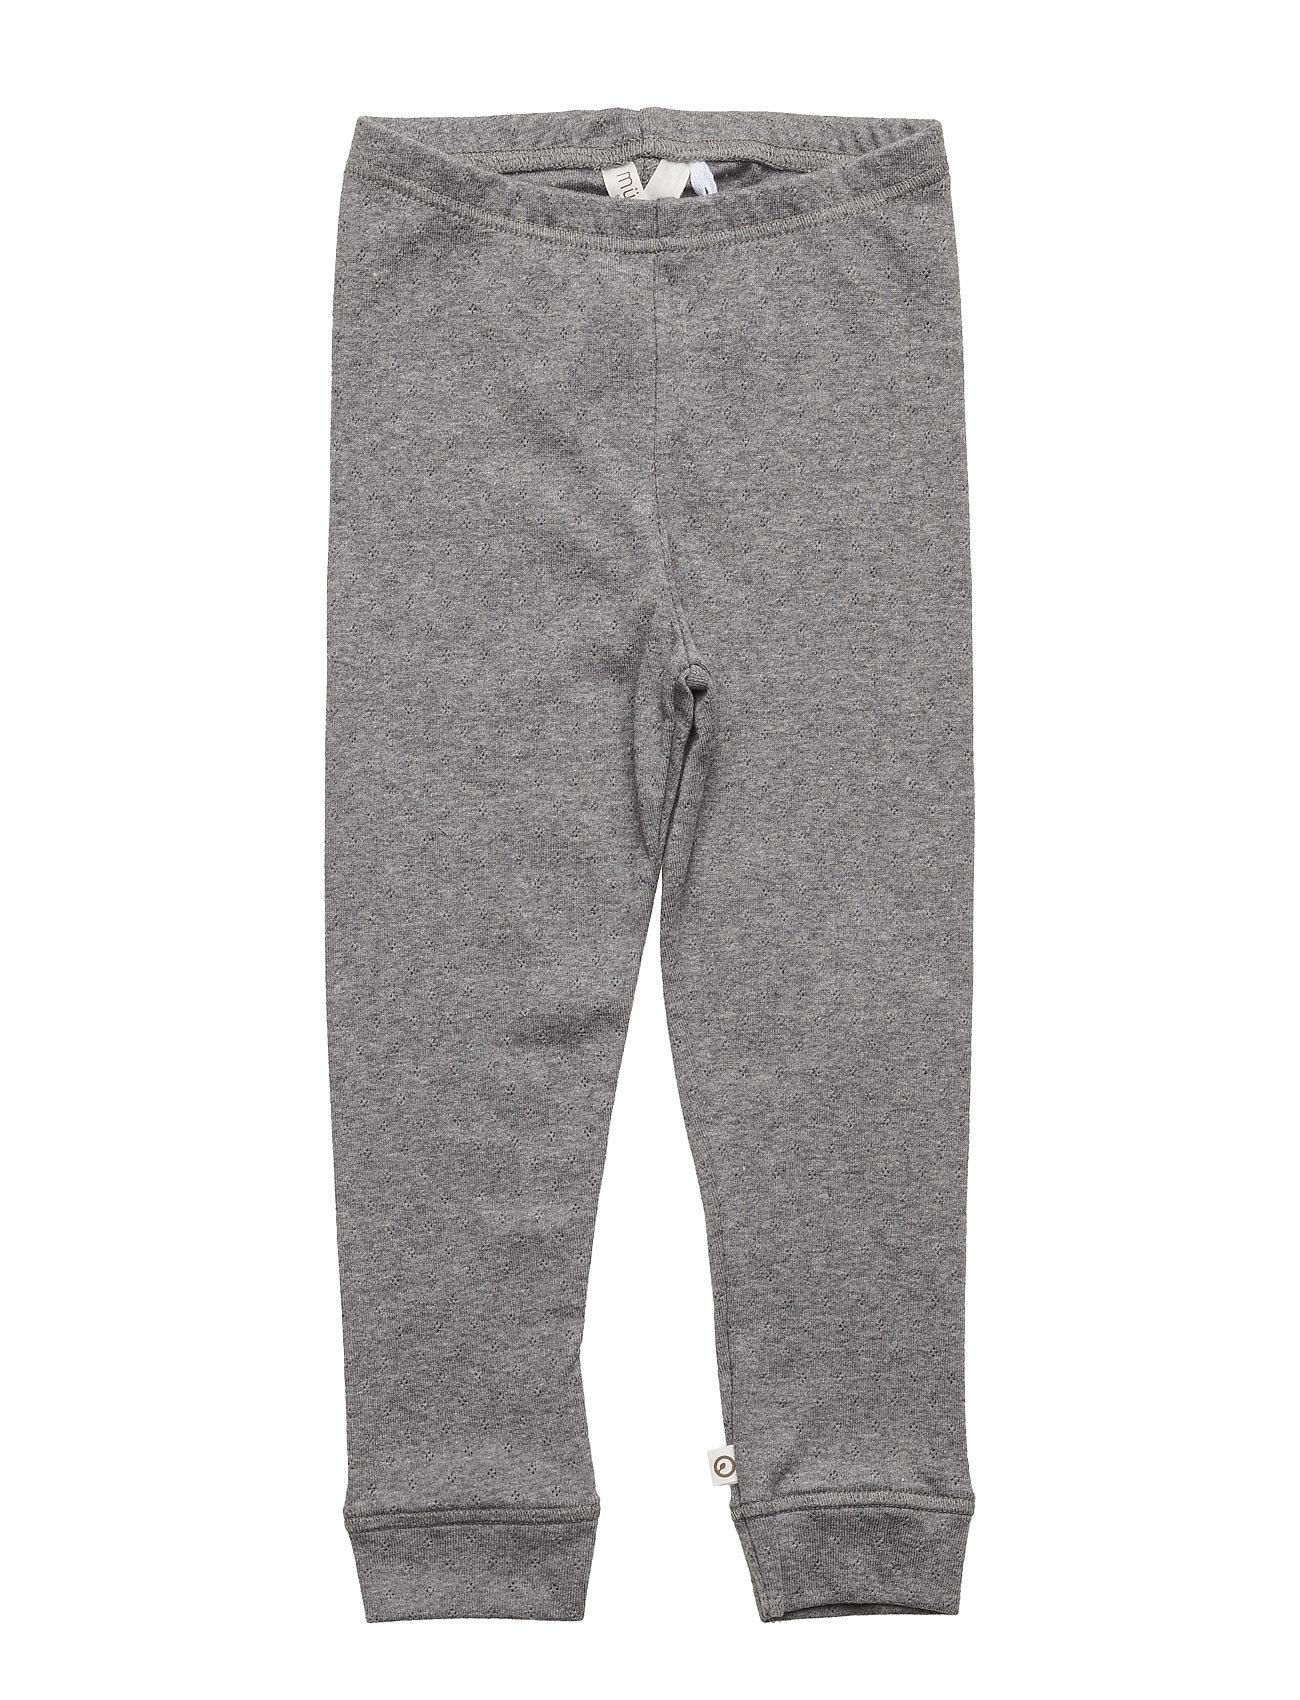 Bedtime Leggings Baby M¸sli by Green Cotton  til Børn i Pale Greymarl